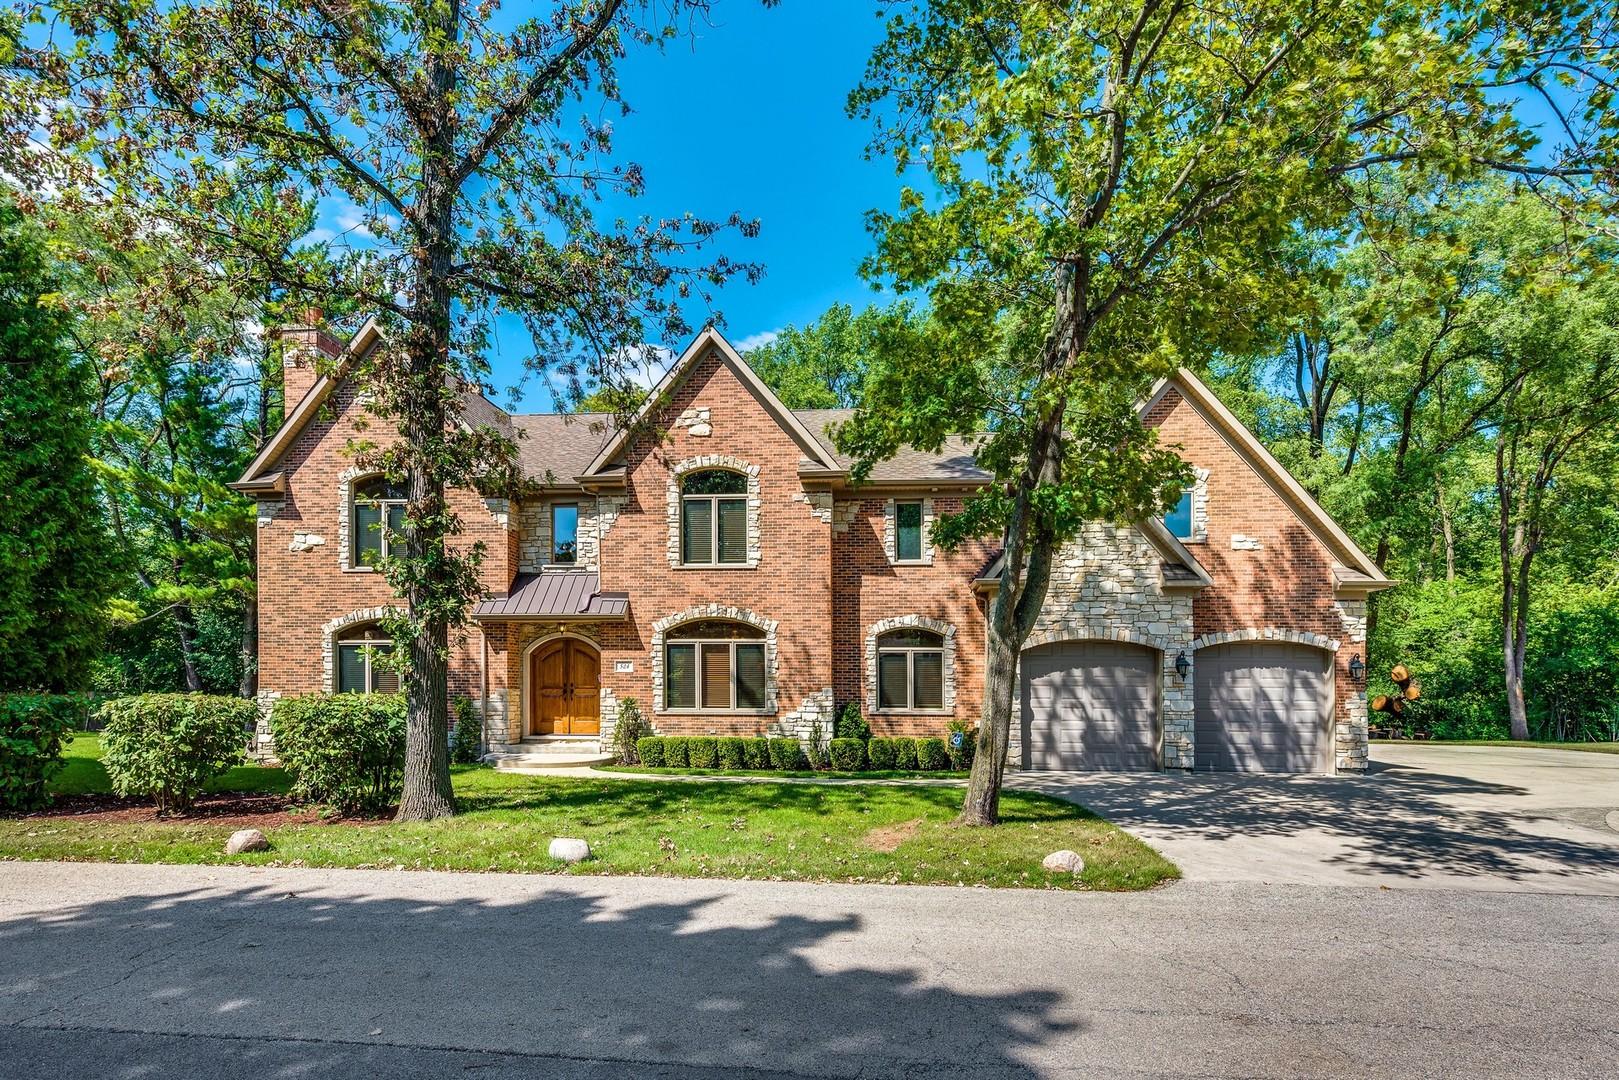 524 East Washington Avenue, Lake Bluff, Illinois 60044